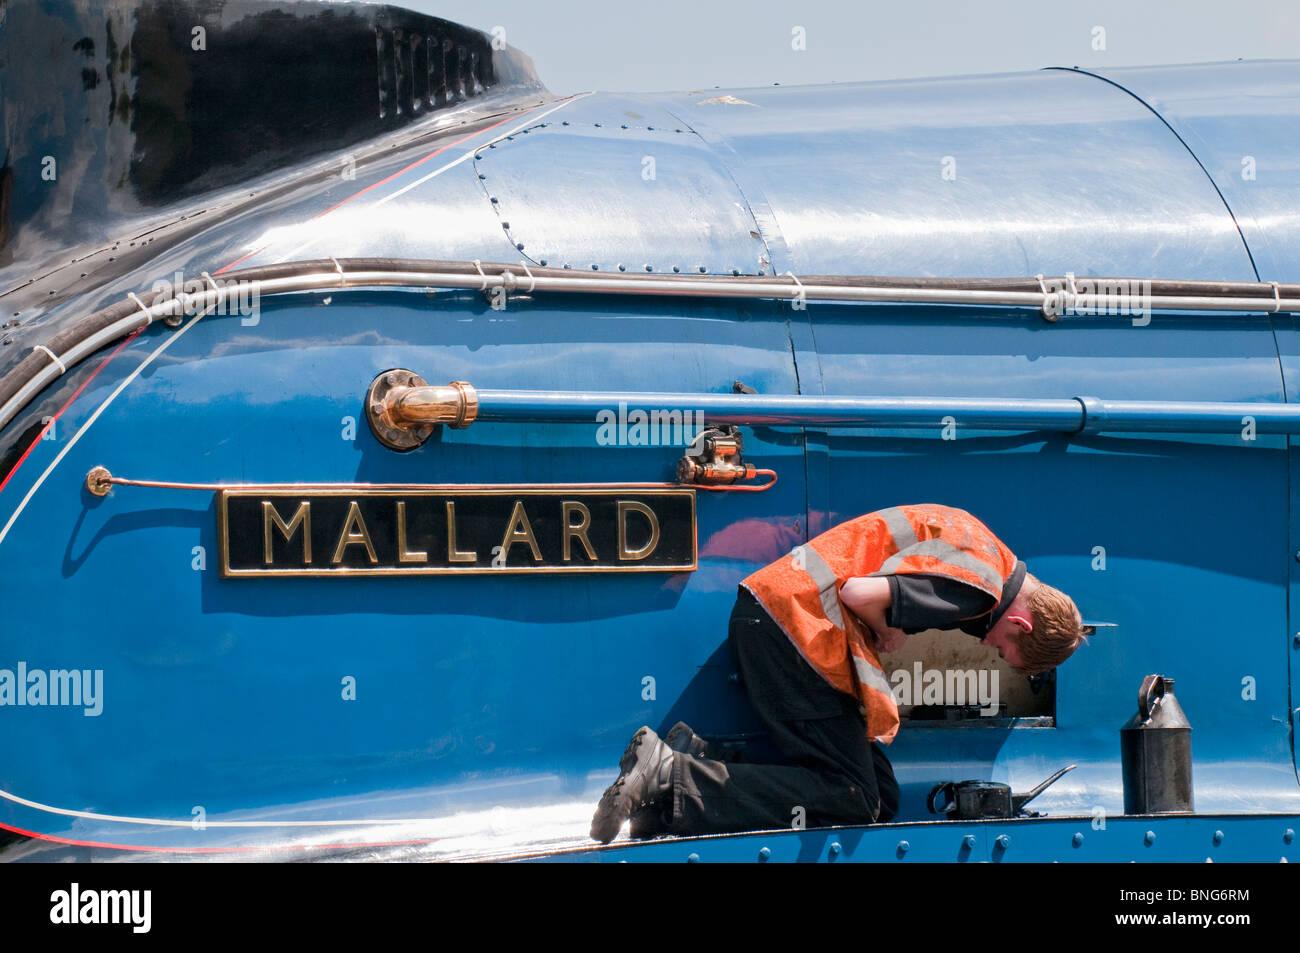 Workman carrying out maintenance checks on the Mallard steam train. - Stock Image